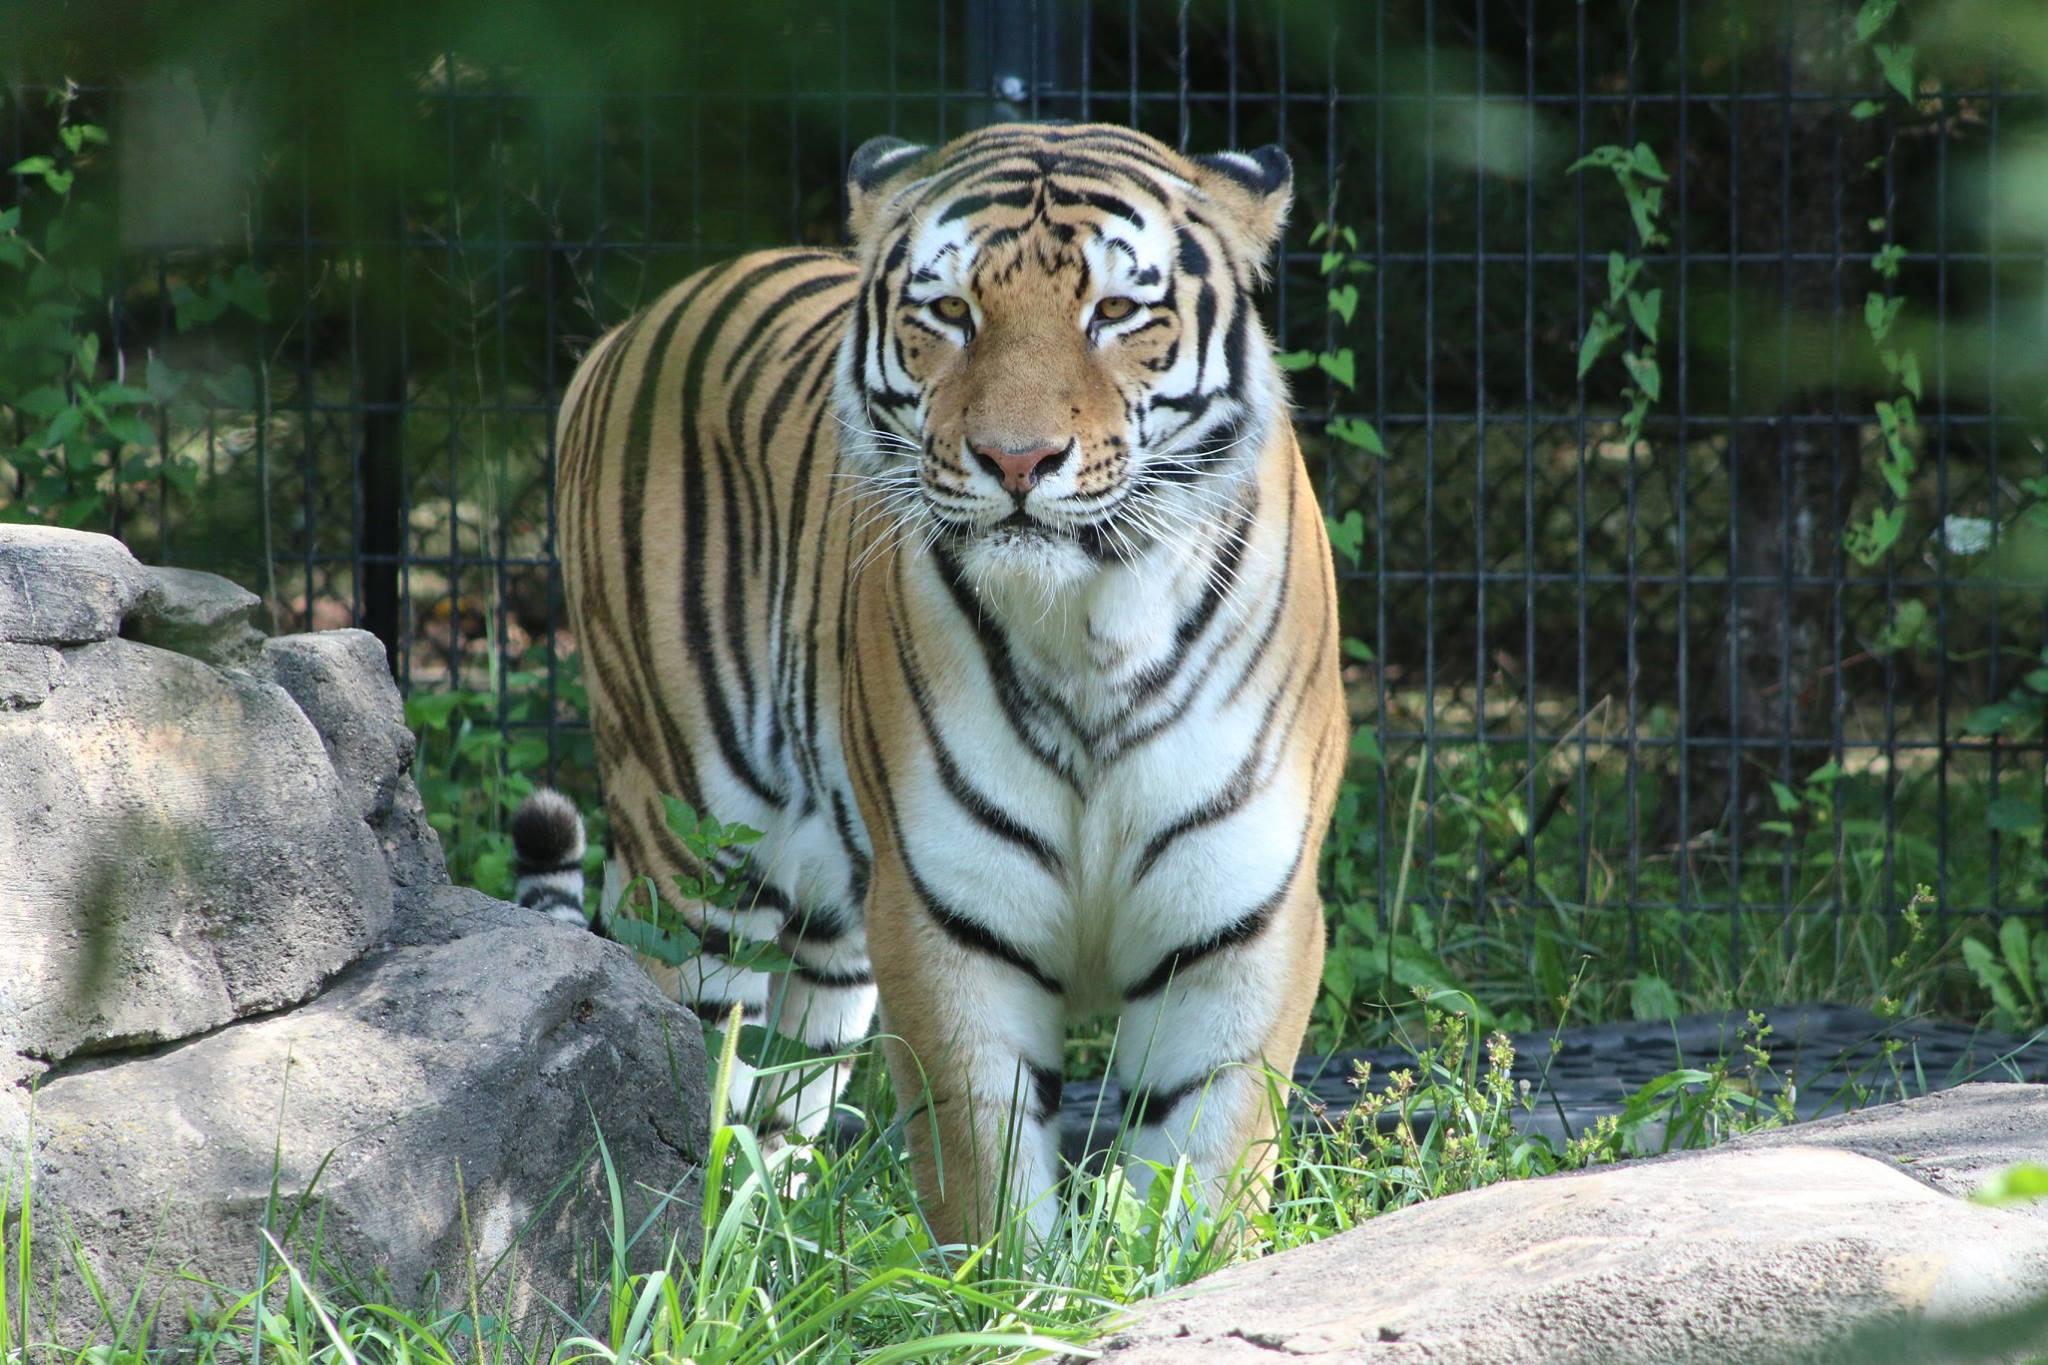 Blank Park Zoo Calendar : Tiger dies from cancer at blank park zoo ktiv news